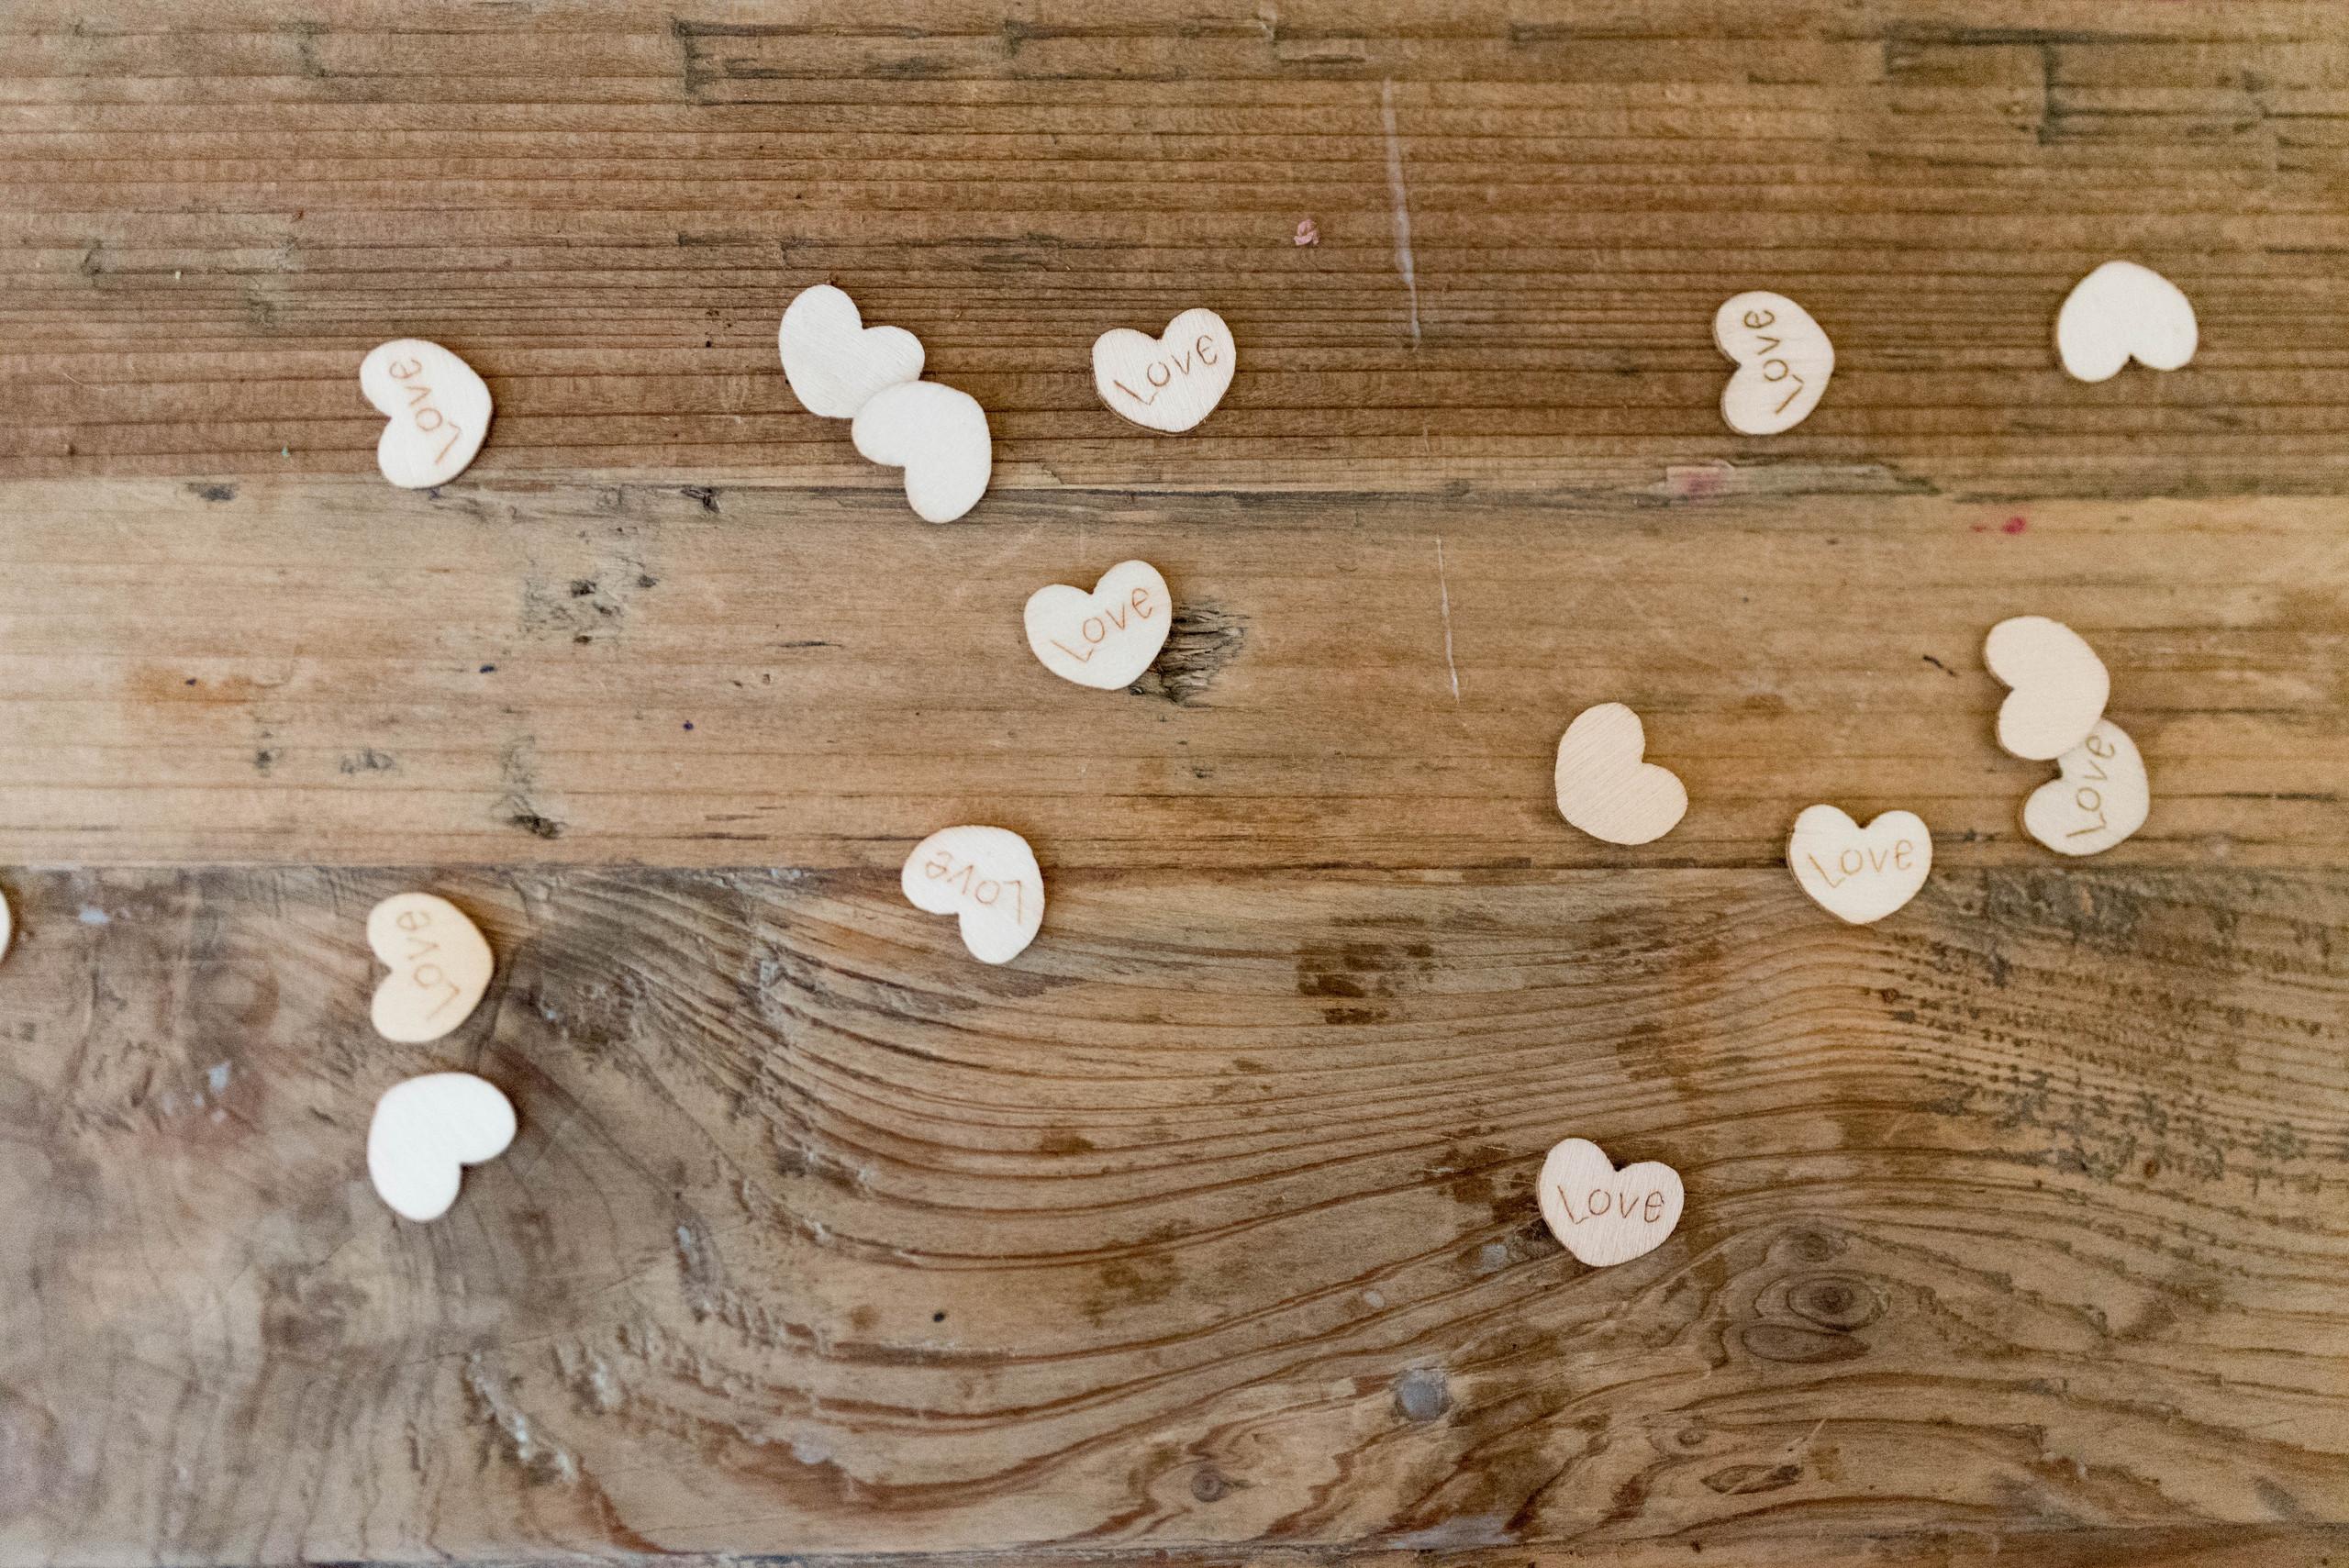 aswanley wedding, aswanley, aswanley glass, aswanley huntly, barn wedding scotland, barn wedding venue, barn venues scotland, wedding photographers fife, scotland, scottish, wedding, photography, kirknewton stables, wedding photographers edinburgh, fife wedding photographers, fife photographers, secret herb garden, junebug, wedding photographers in fife, photographers fife, family portraits fife, barn wedding venues fife, barn wedding venues edinburgh, barn wedding venues scotland, barn wedding scotland, barn wedding fife, light airy wedding photography, light airy wedding photography scotland, wedding photographers edinburgh, wedding photographers scotland, fine art wedding photographers, fine art wedding photographers scotland, creative wedding photographers, perthshire wedding photography, fife wedding photography, ayrshire wedding photography, wedding photography edinburgh prices, scotland wedding photography, rustic wedding photography, light wedding photography, edinburgh elopement packages, scotland elopement packages, archerfield wedding, julie tinton, craig and eva sanders, neil thomas douglas, kinkell byre, kinkell byre wedding, pratis barn, pratis barn wedding, harelaw farm, harelaw farm wedding, gg's yard, gg's yard wedding, knockraich farm wedding, the cowshed crail, crear weddings, errol park weddings, errol park, the byre at inchyra, the byre at inchyra wedding, pratis farm leven, farm wedding scotland, farm weddings scotland, glitter photography, glitter and twigs, jill cherry photography, jill cherry, cherry photography, glitter twigs, kinkell byre st andrews, sarah brown jewellery, hermione harbutt, best contemporary photographers, scottish elopement photographer, mykonos wedding, mykonos wedding photographer, hippie fish wedding, guardswell farm, killearn village hall, windmill barn, junebug, secret herb garden, london wedding planners, scotland wedding planners, timeless white, timeless white wedding planning, wedding planning, wedding planning s